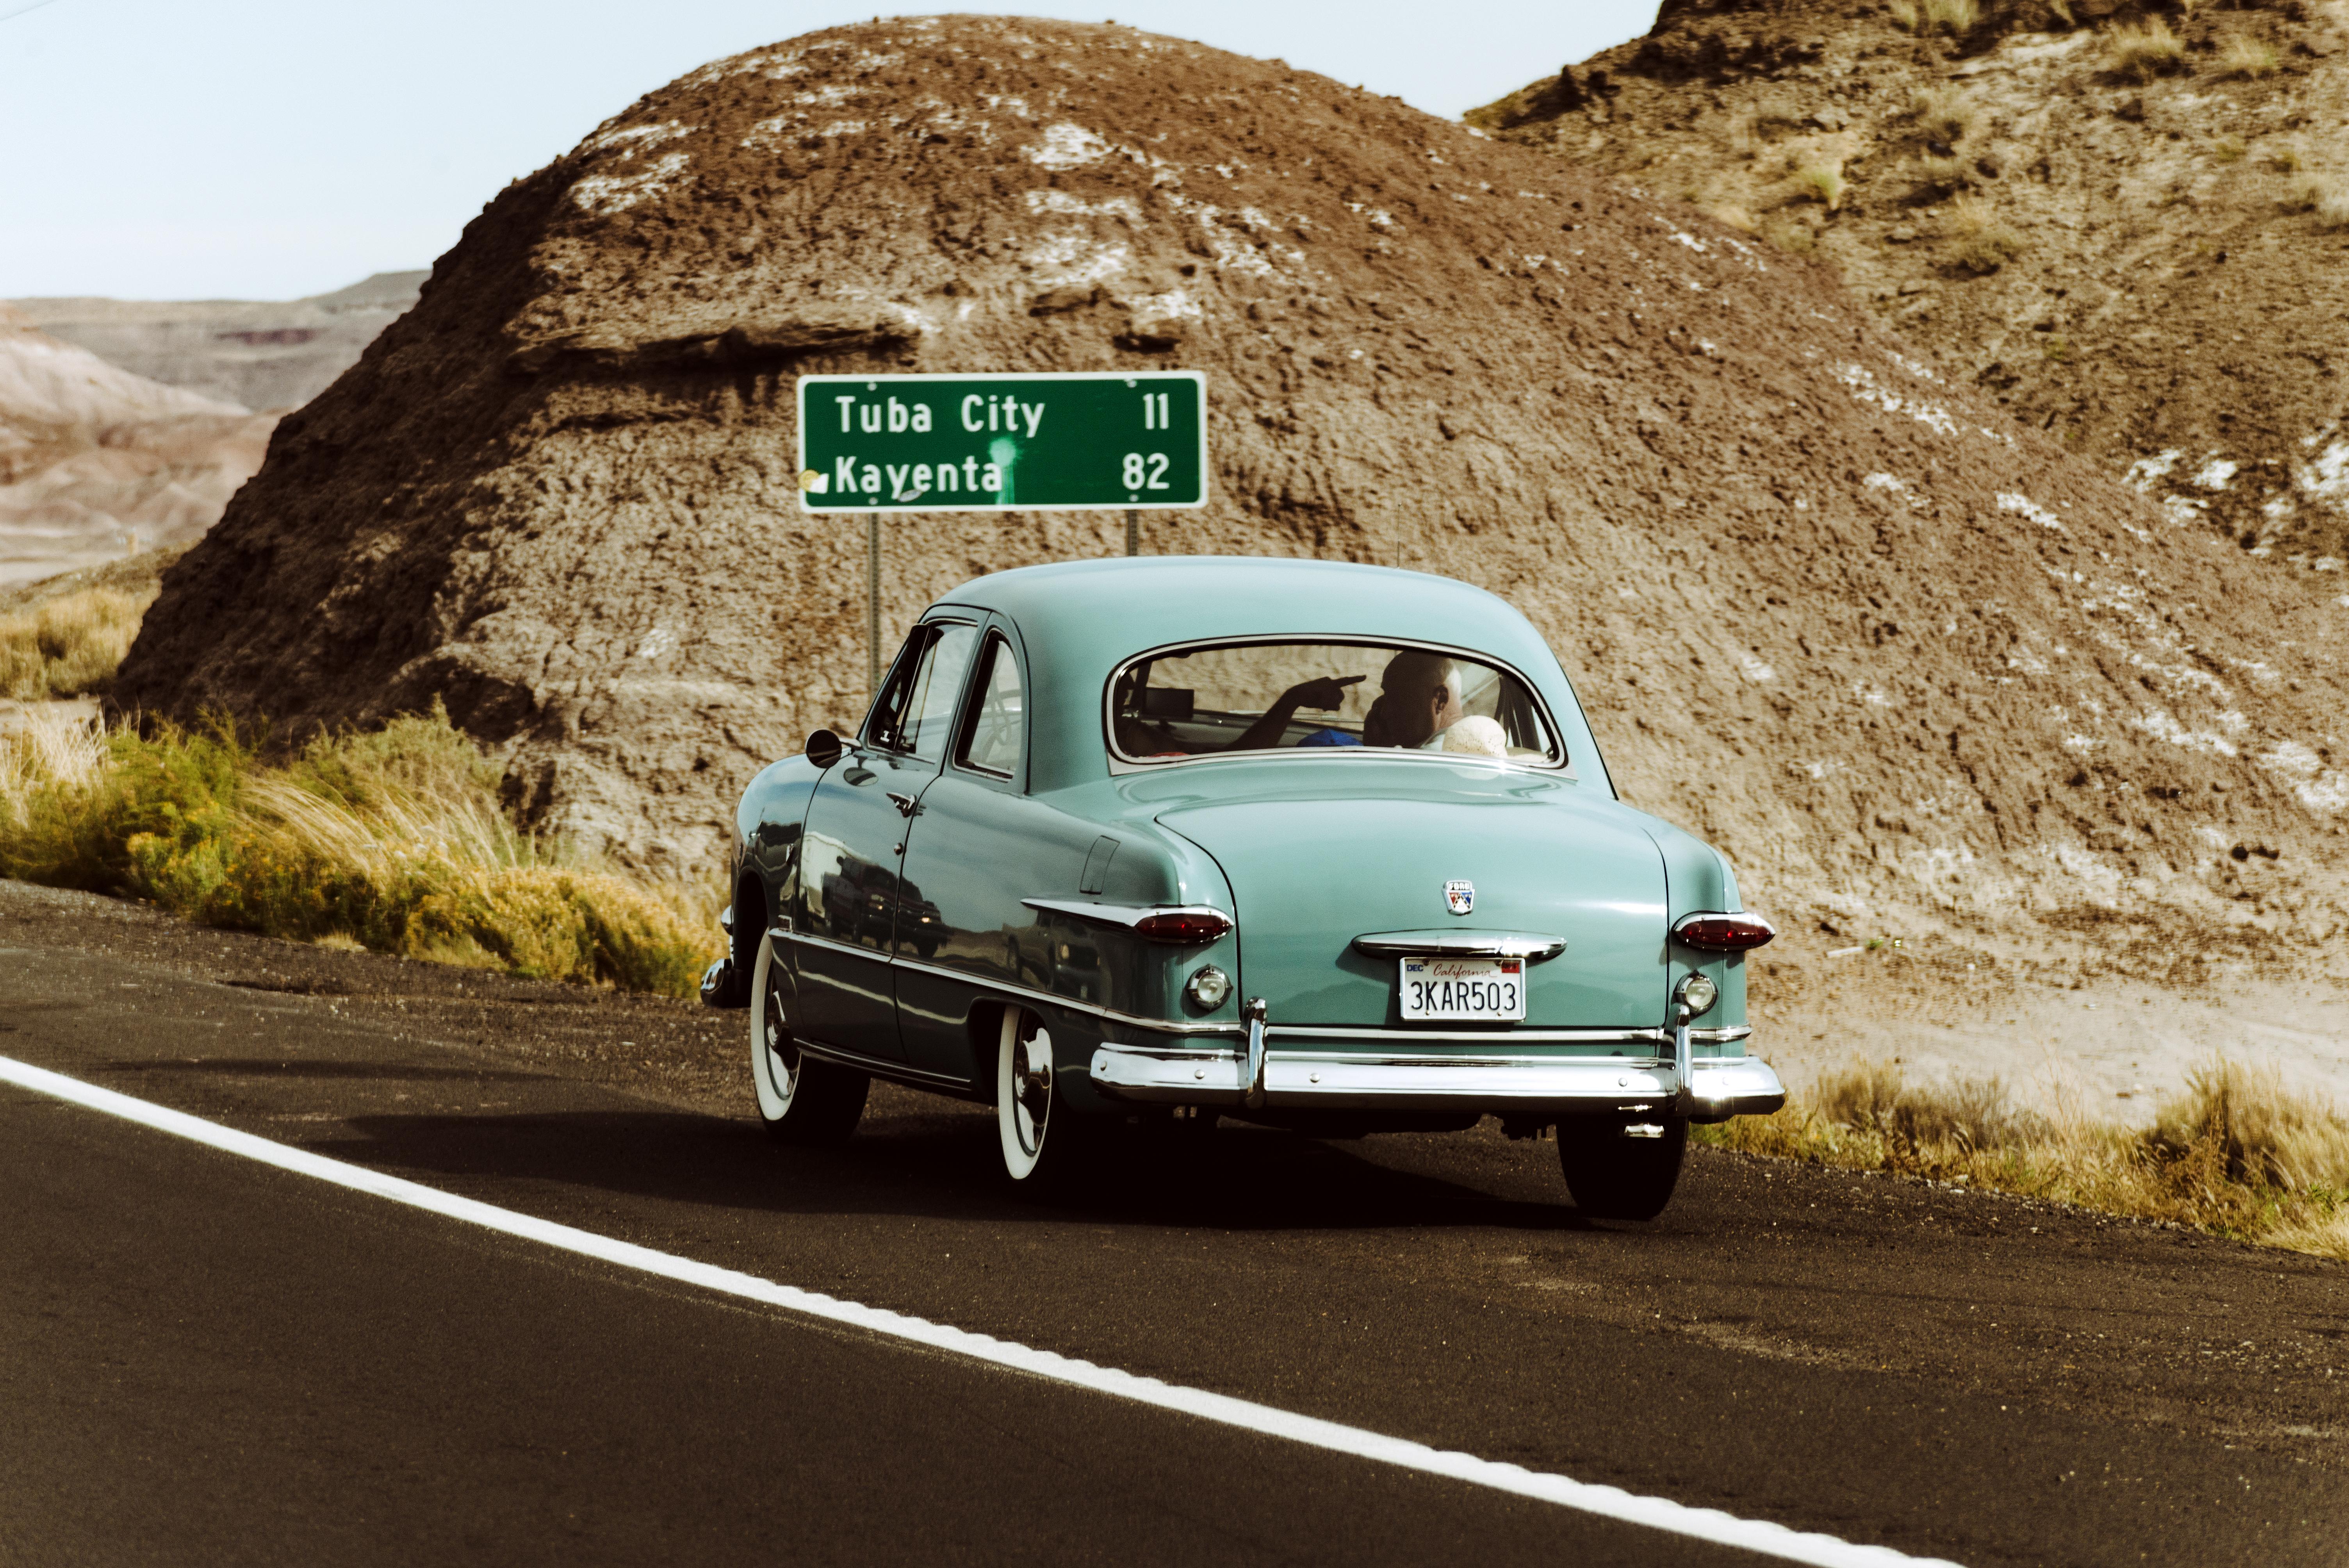 Free stock photos of vintage car · Pexels